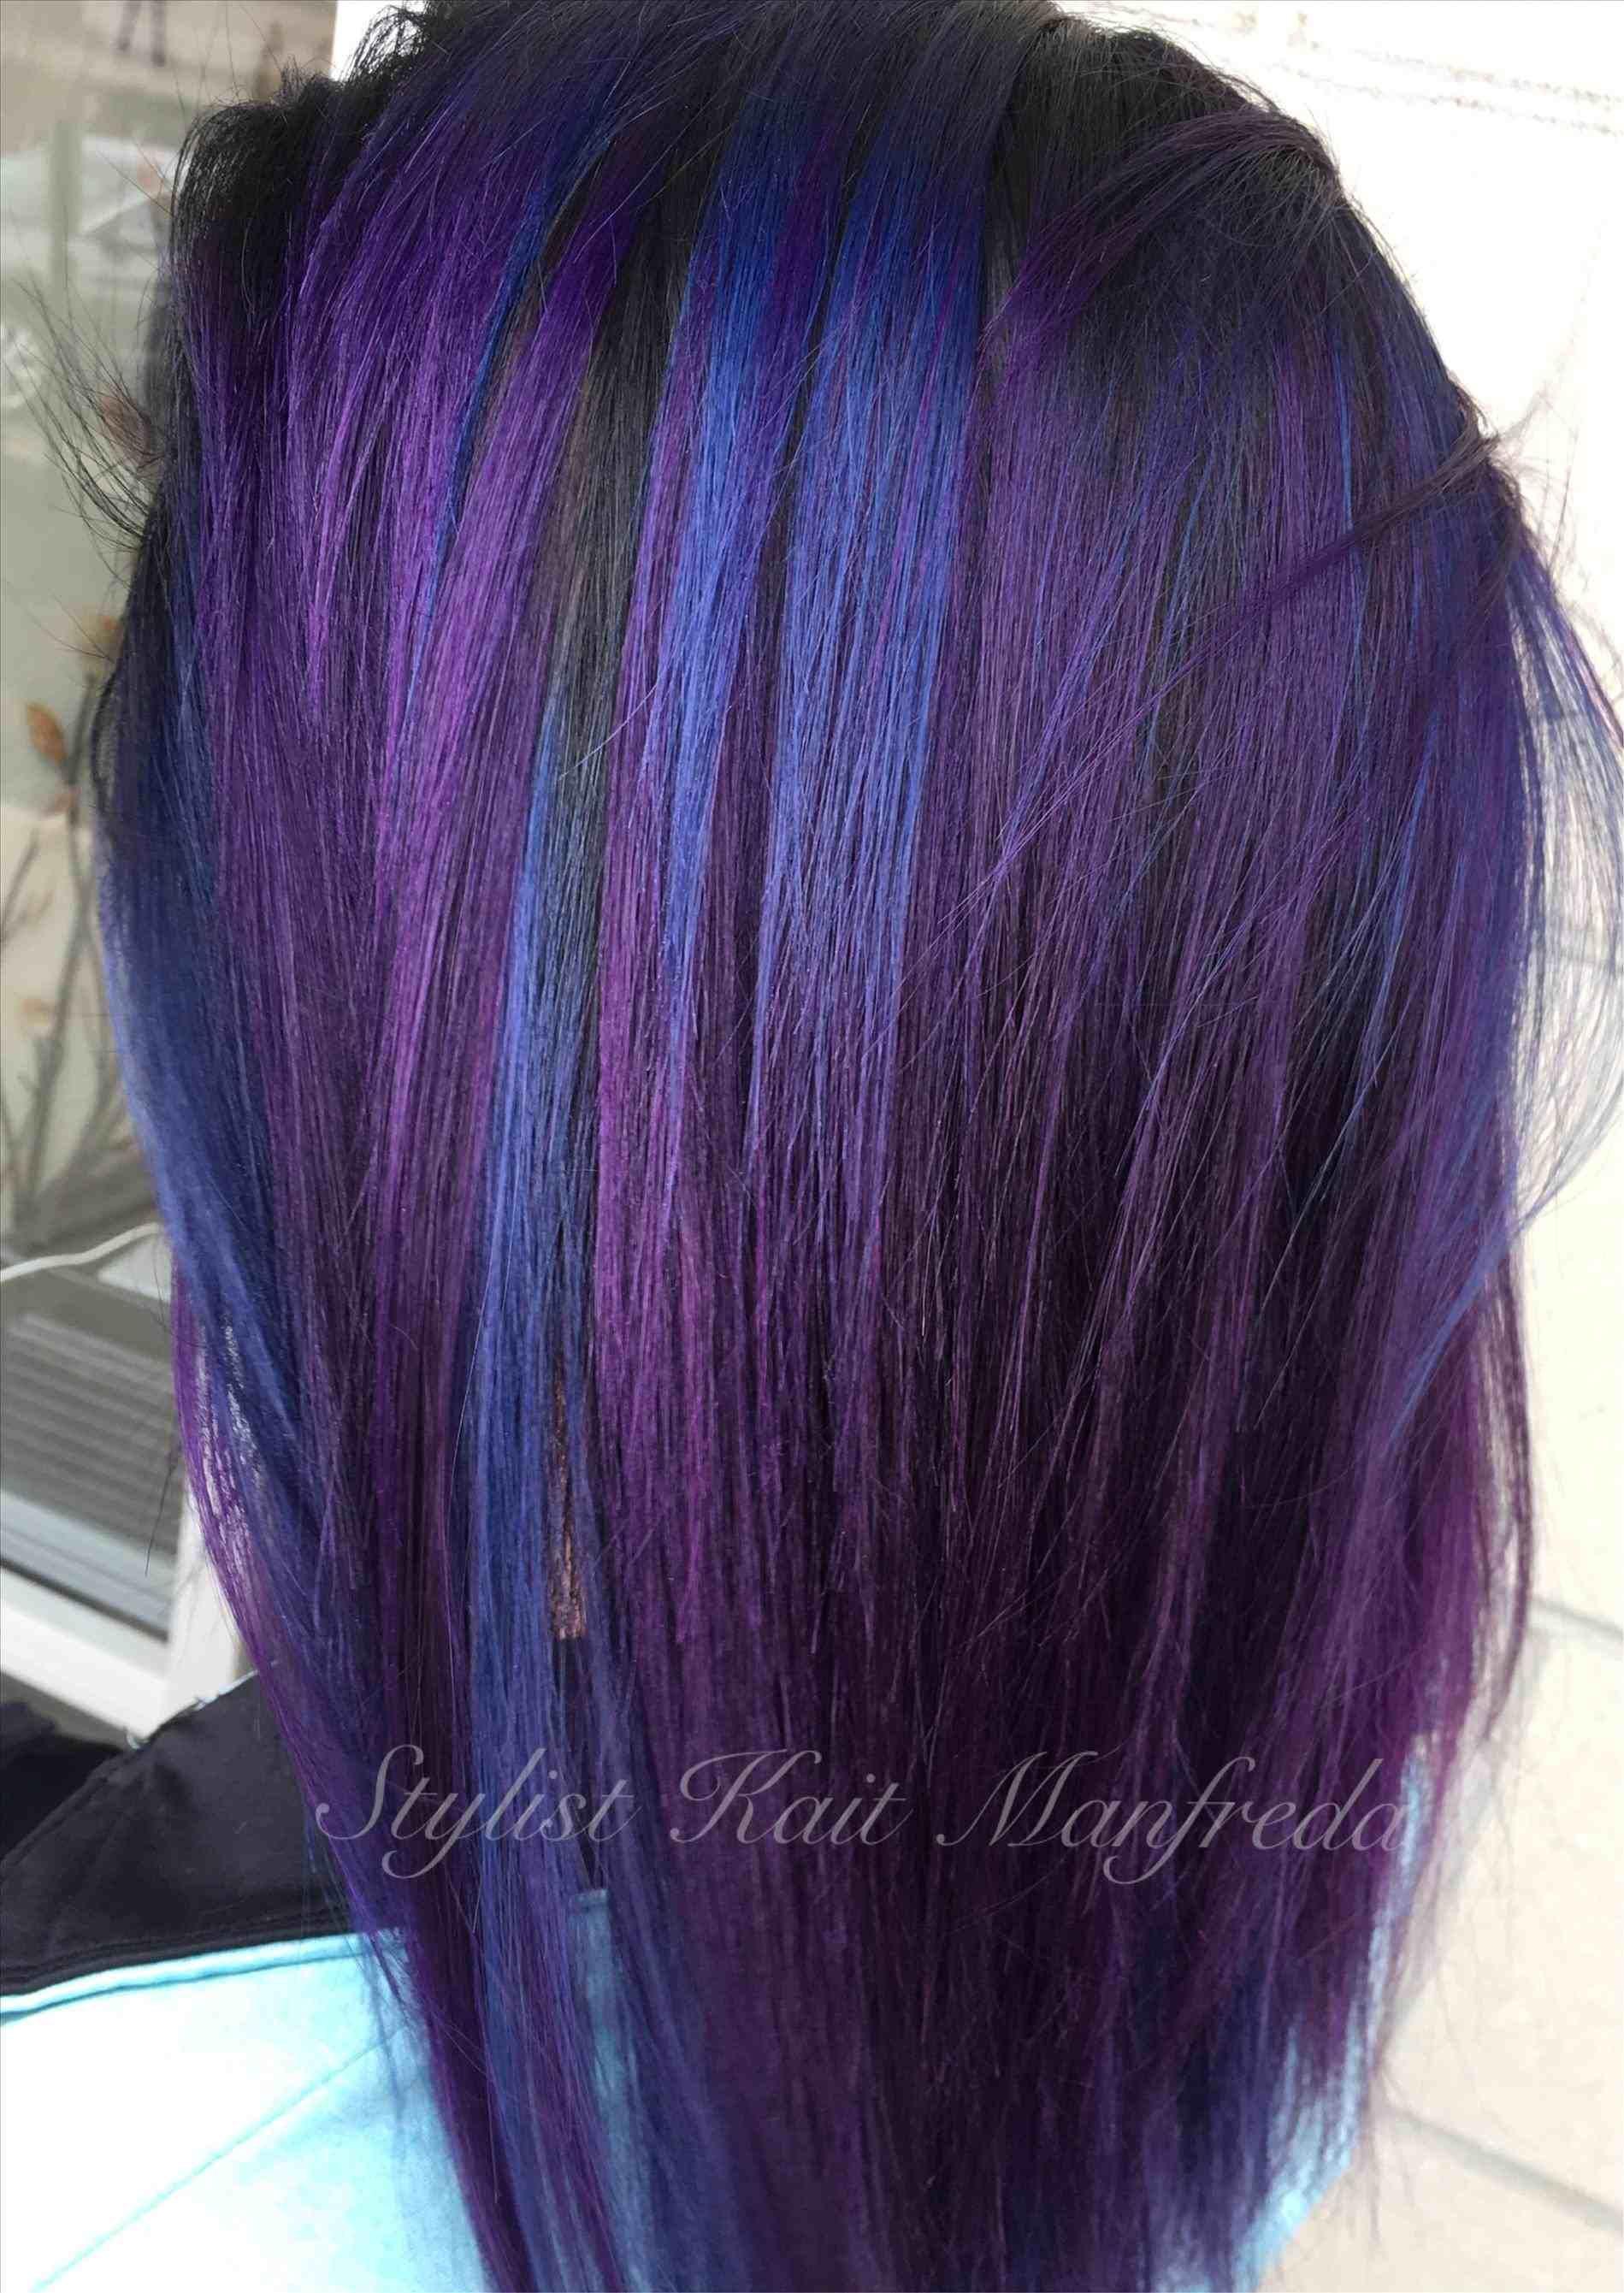 Dark Auburn Purple Hair Color Hair Stylist And Models Pinterest